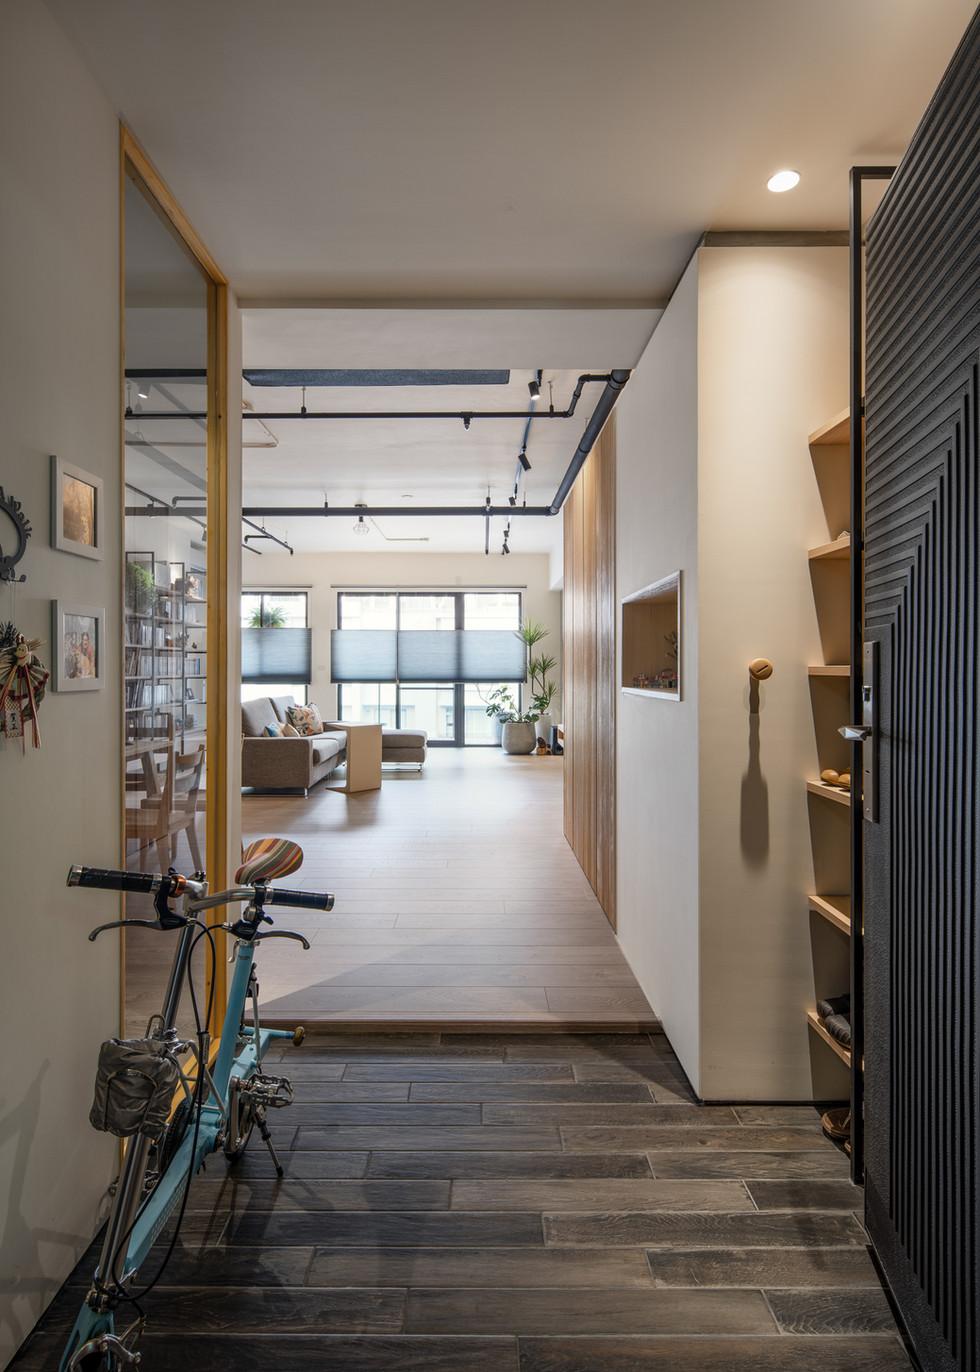 Interiors-13.jpg